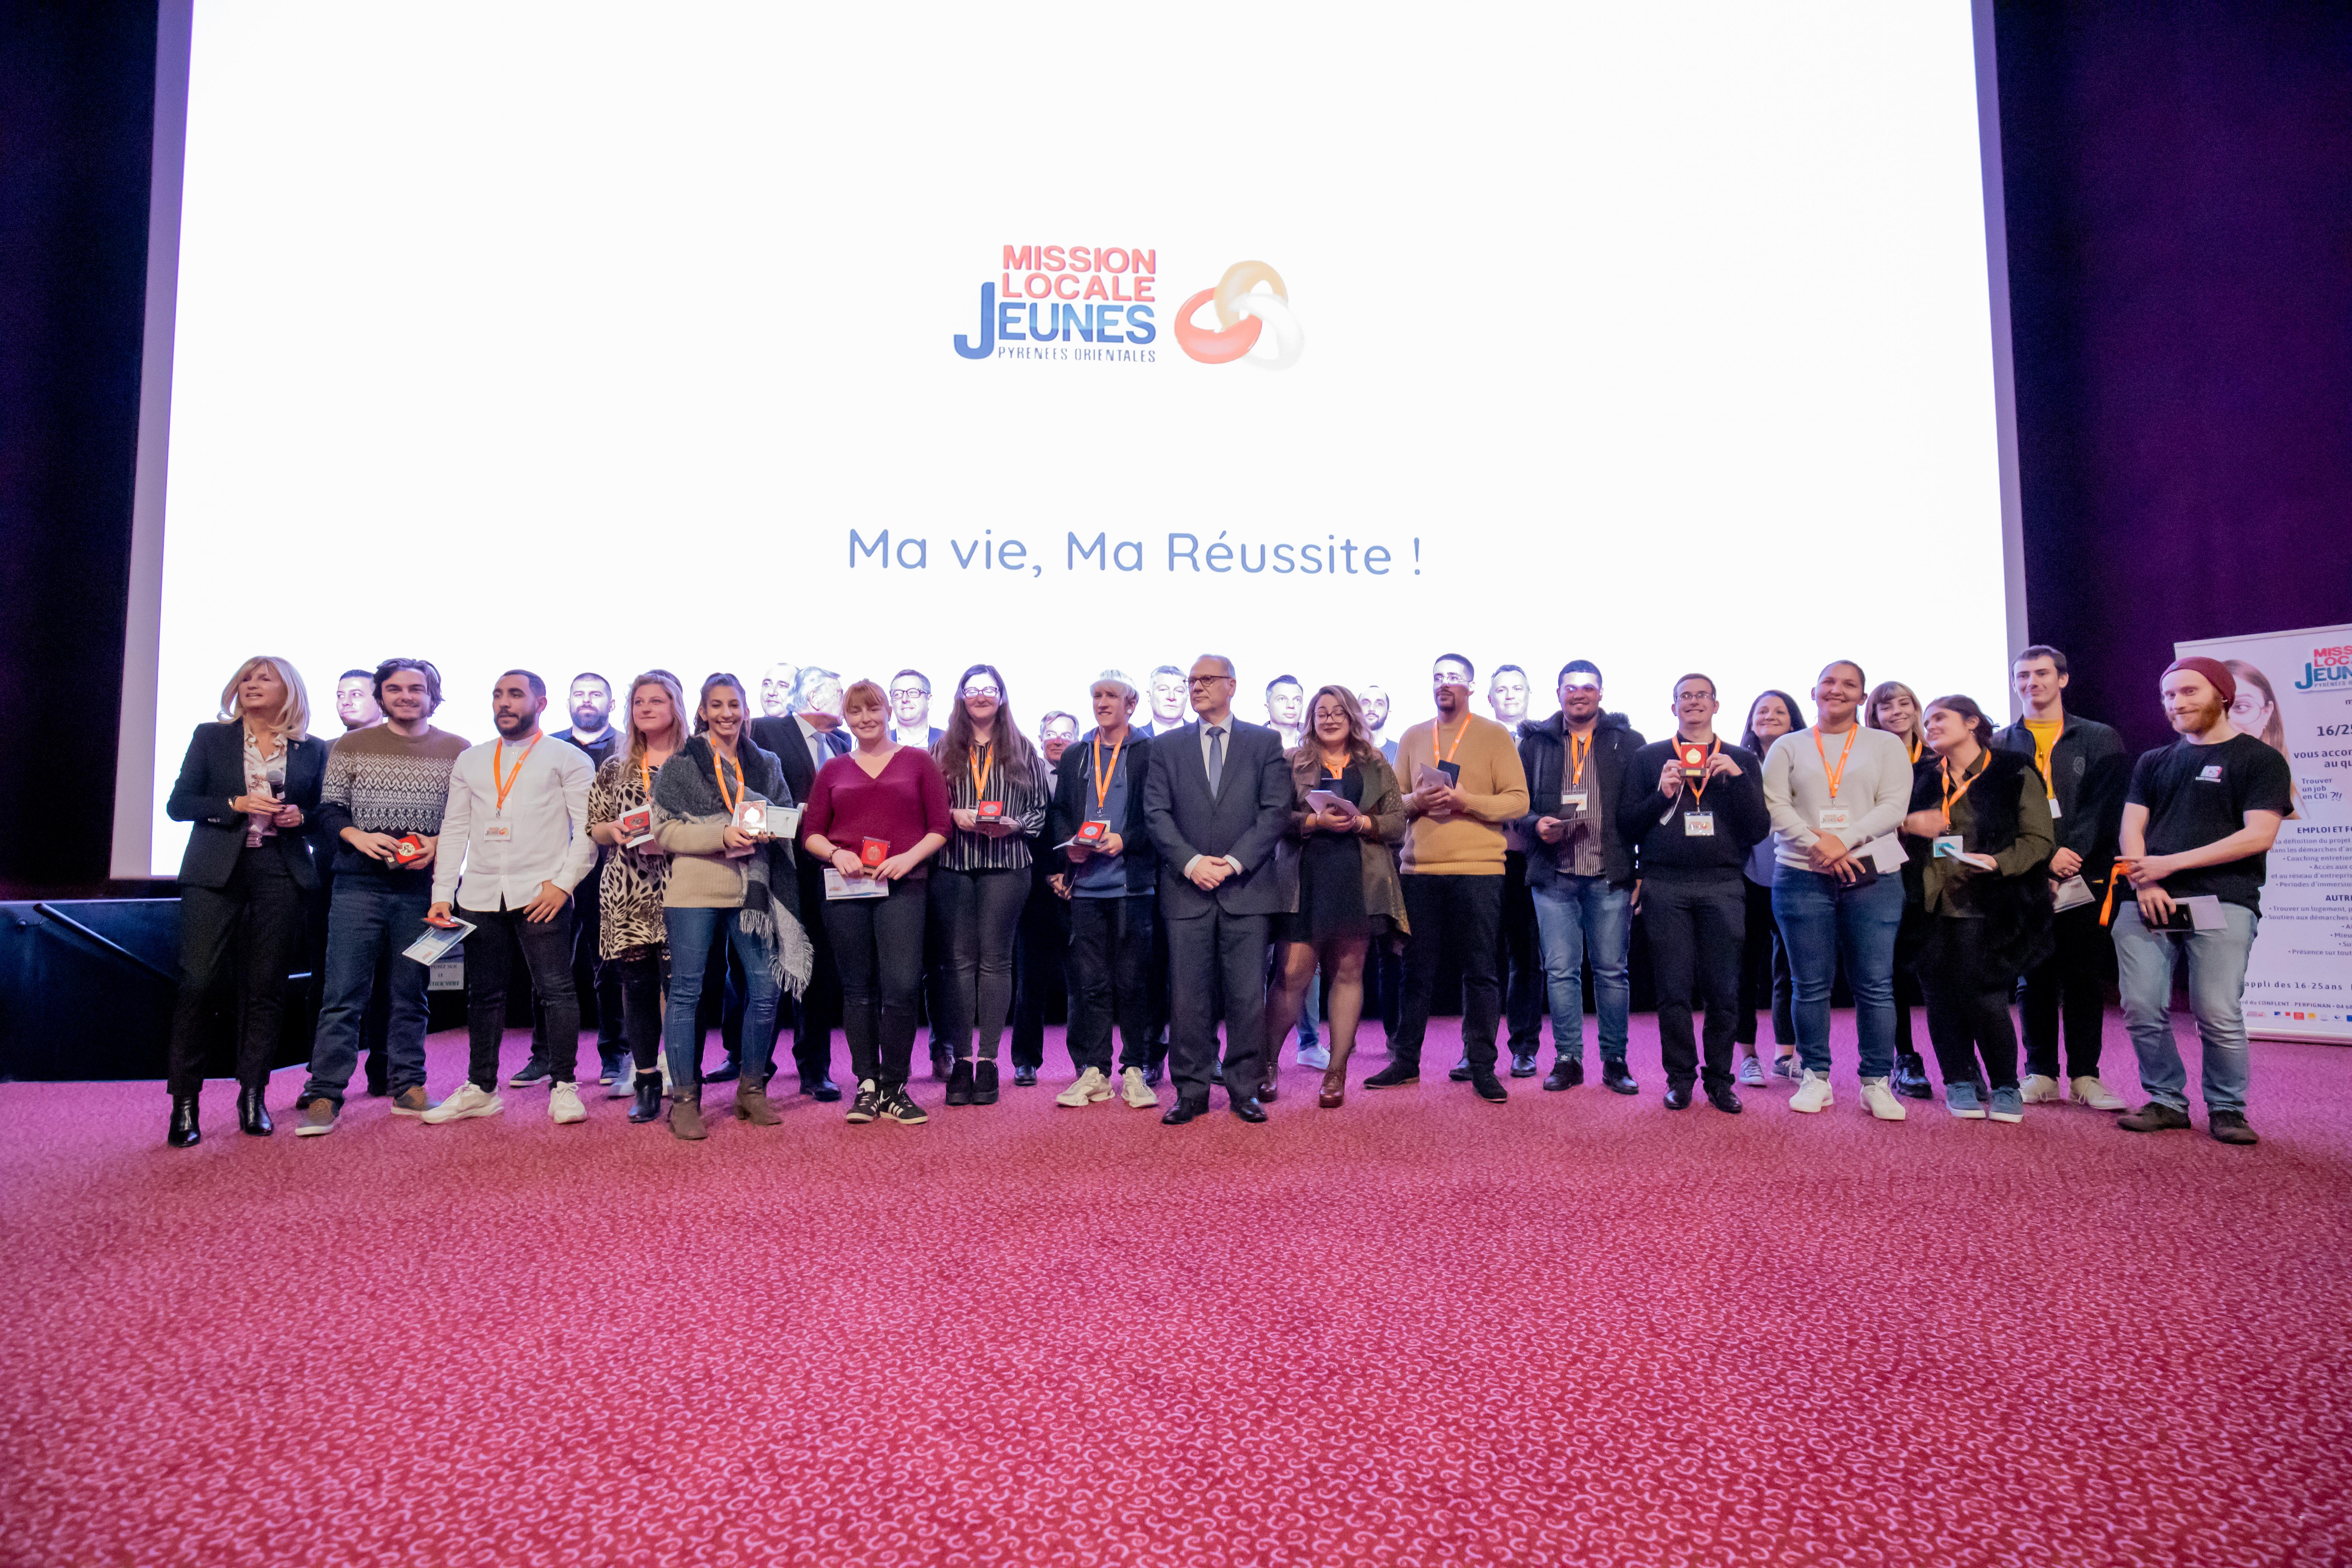 soiree des reussites mlj po 2019